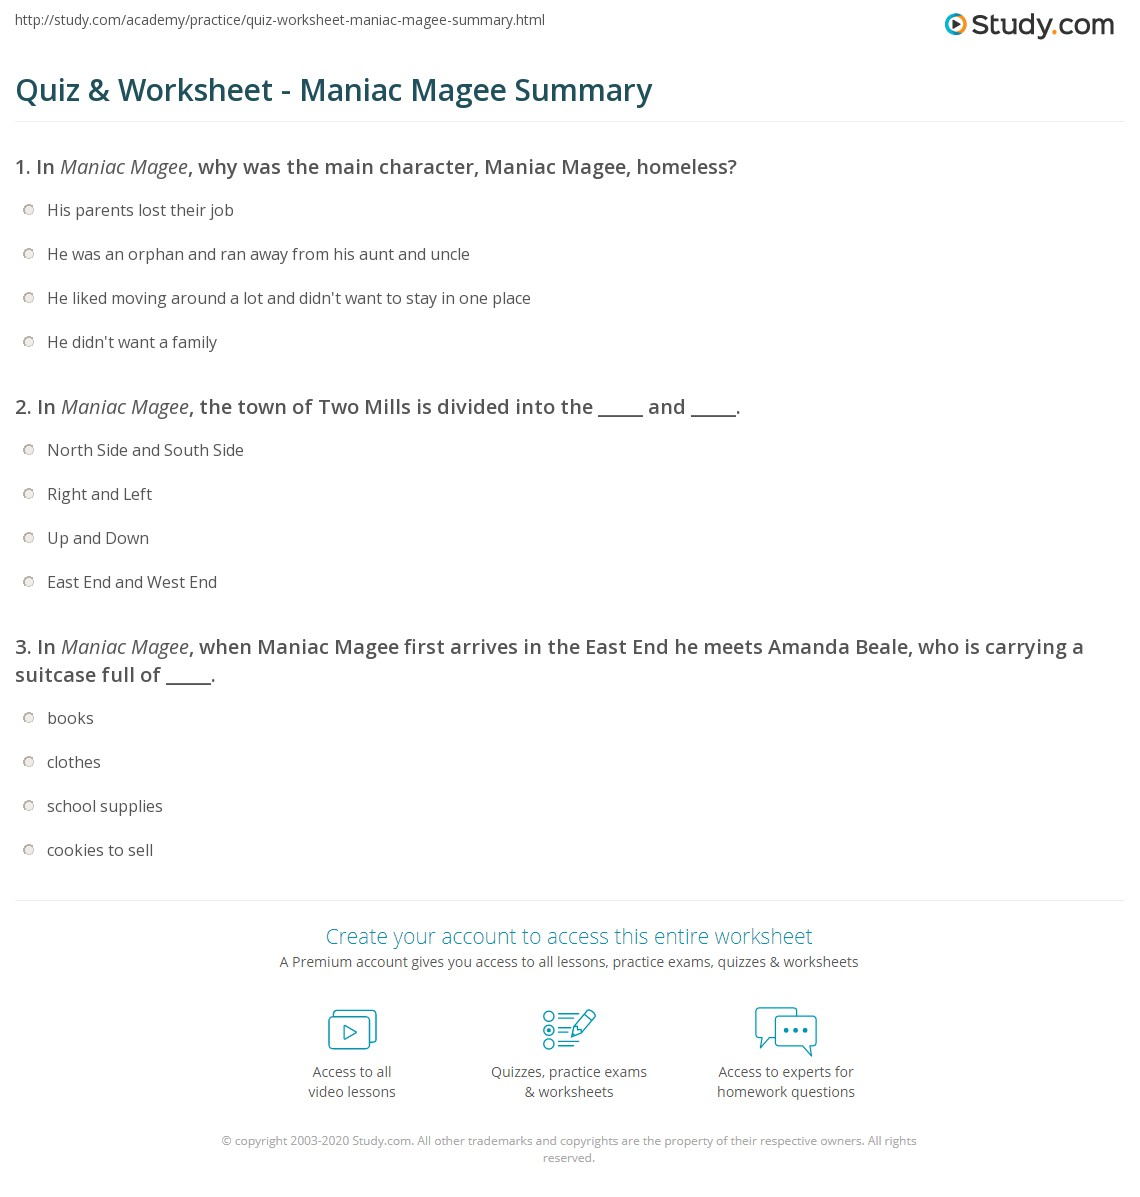 worksheet Maniac Magee Worksheets quiz worksheet maniac magee summary study com print of worksheet